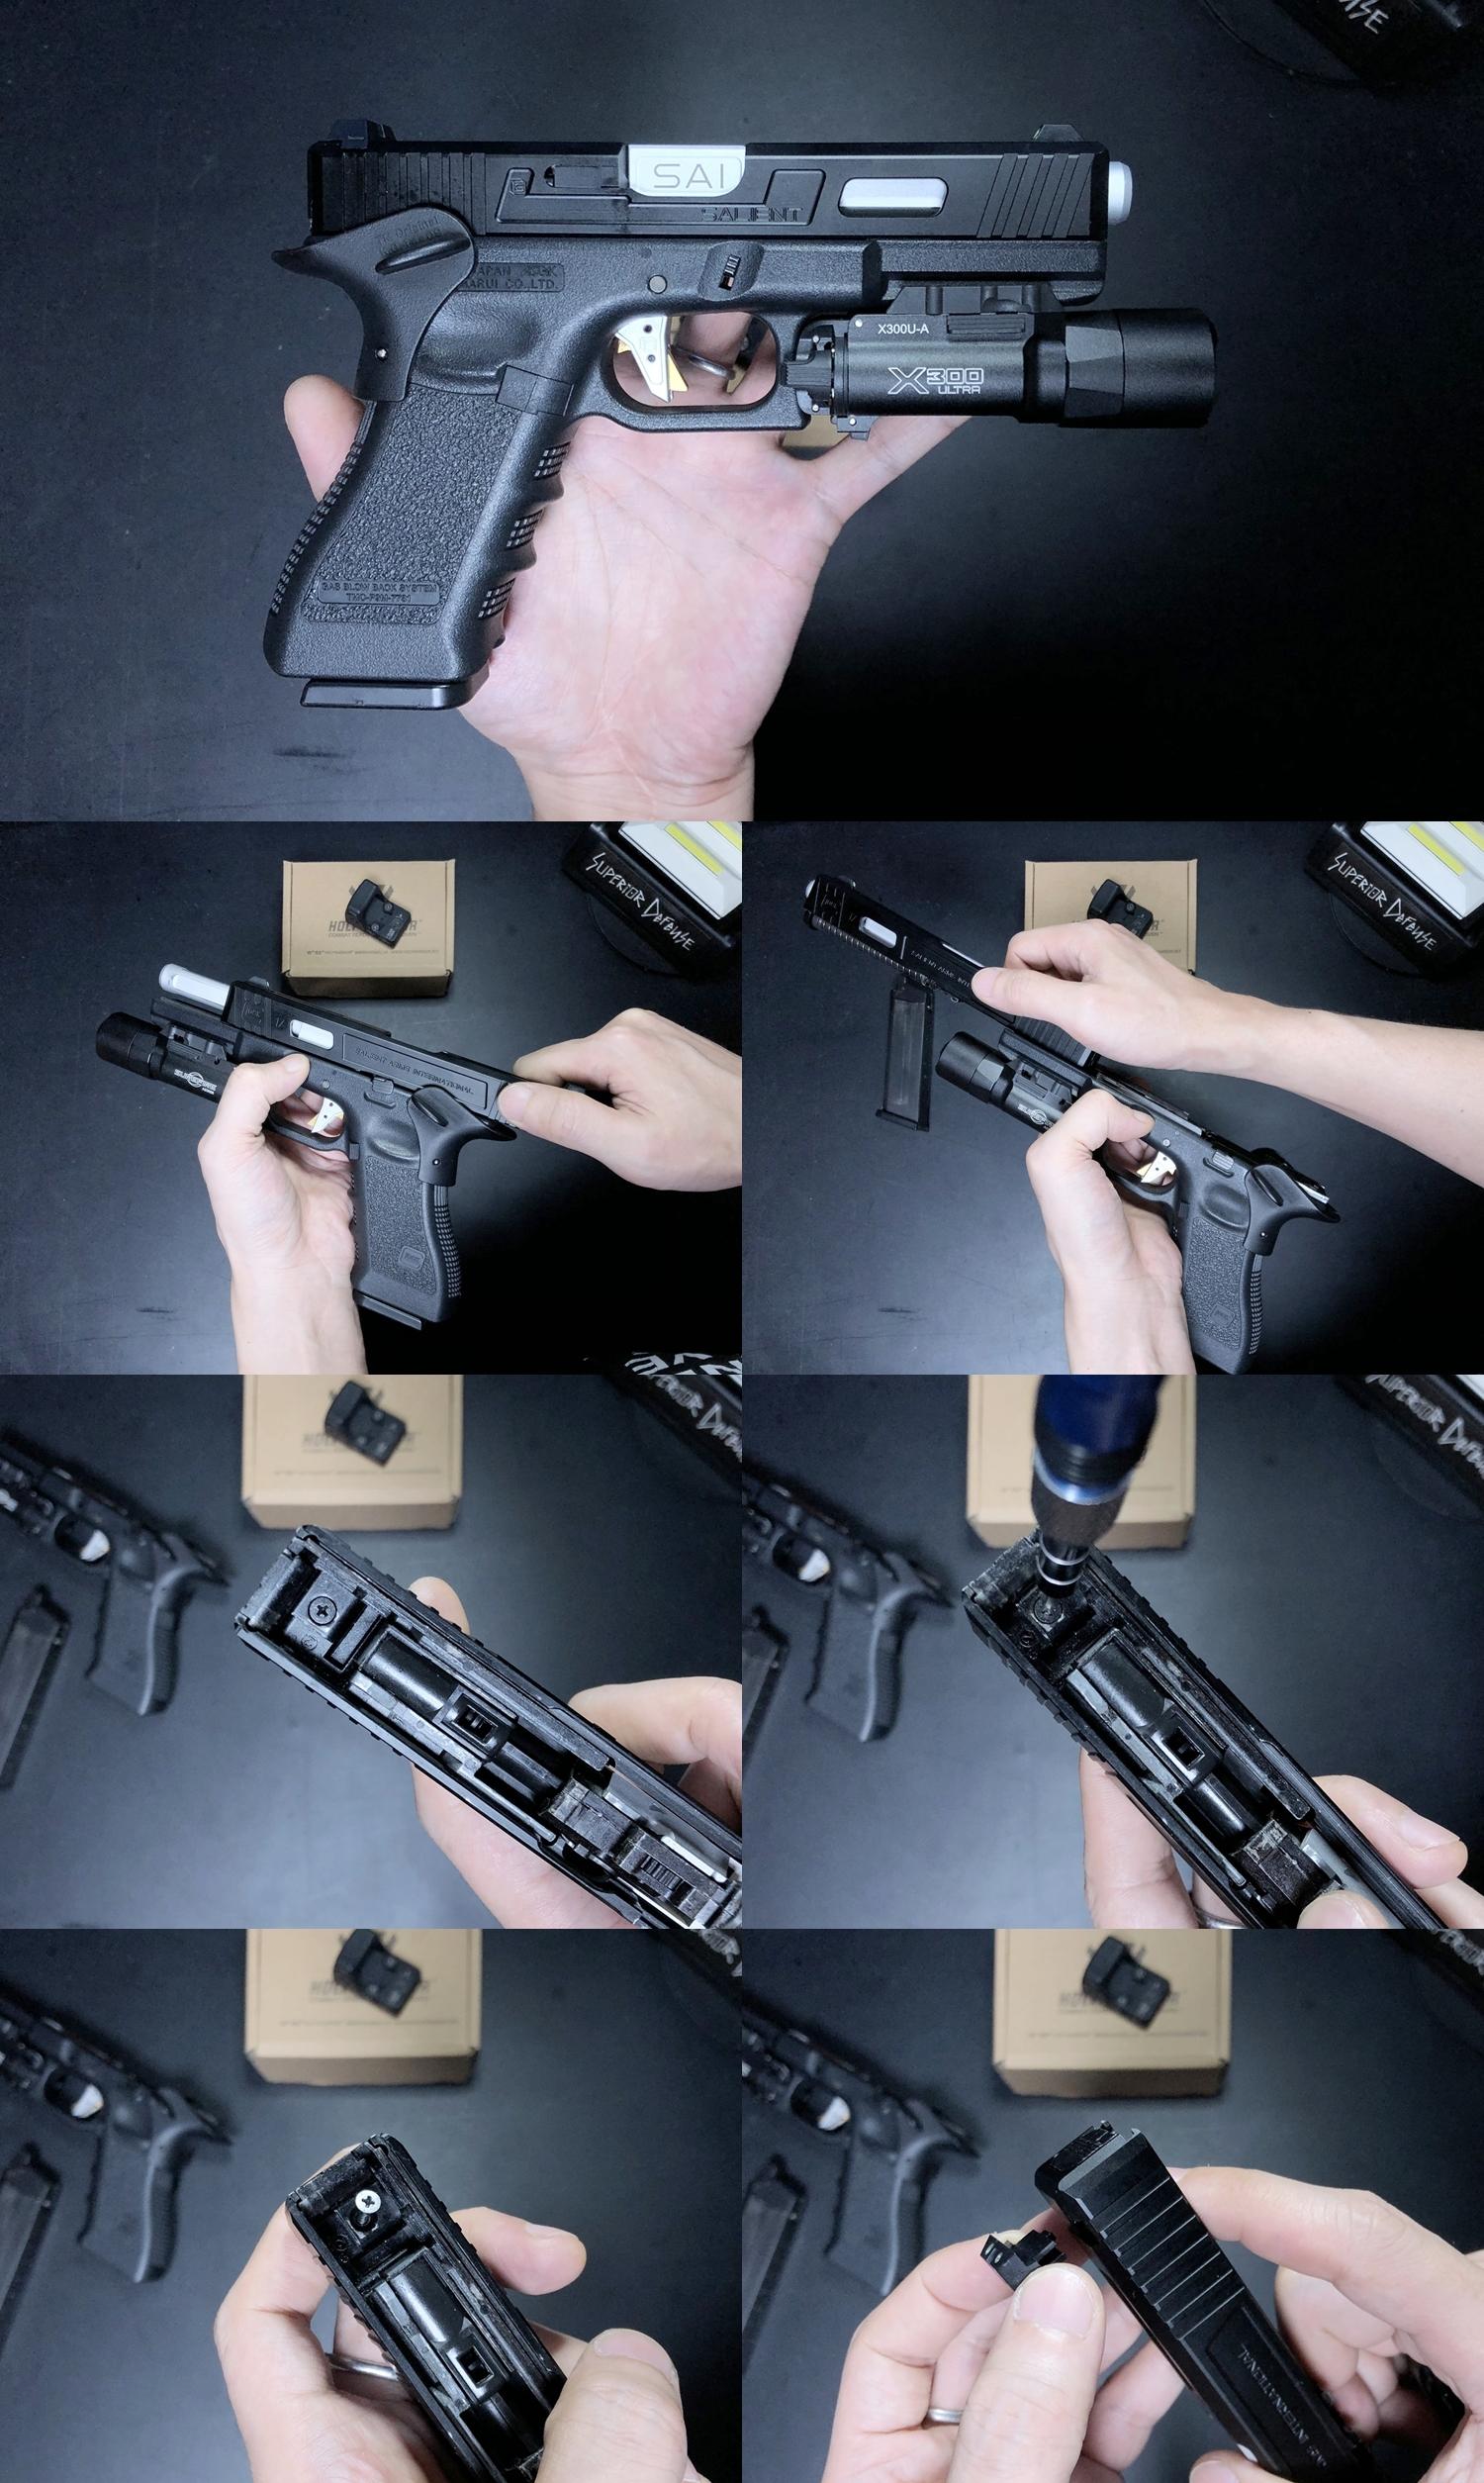 6 HolyWarrior製 RMR Trijicon Type ドットサイト GET!! 噂のHW製 最新 超軽量 複合材質 樹脂 タイプを購入したけど速攻で仲間に奪われました(笑)!! Glock G17 GBB カスタム!! 購入 開封 取付 加工 レビュー!!